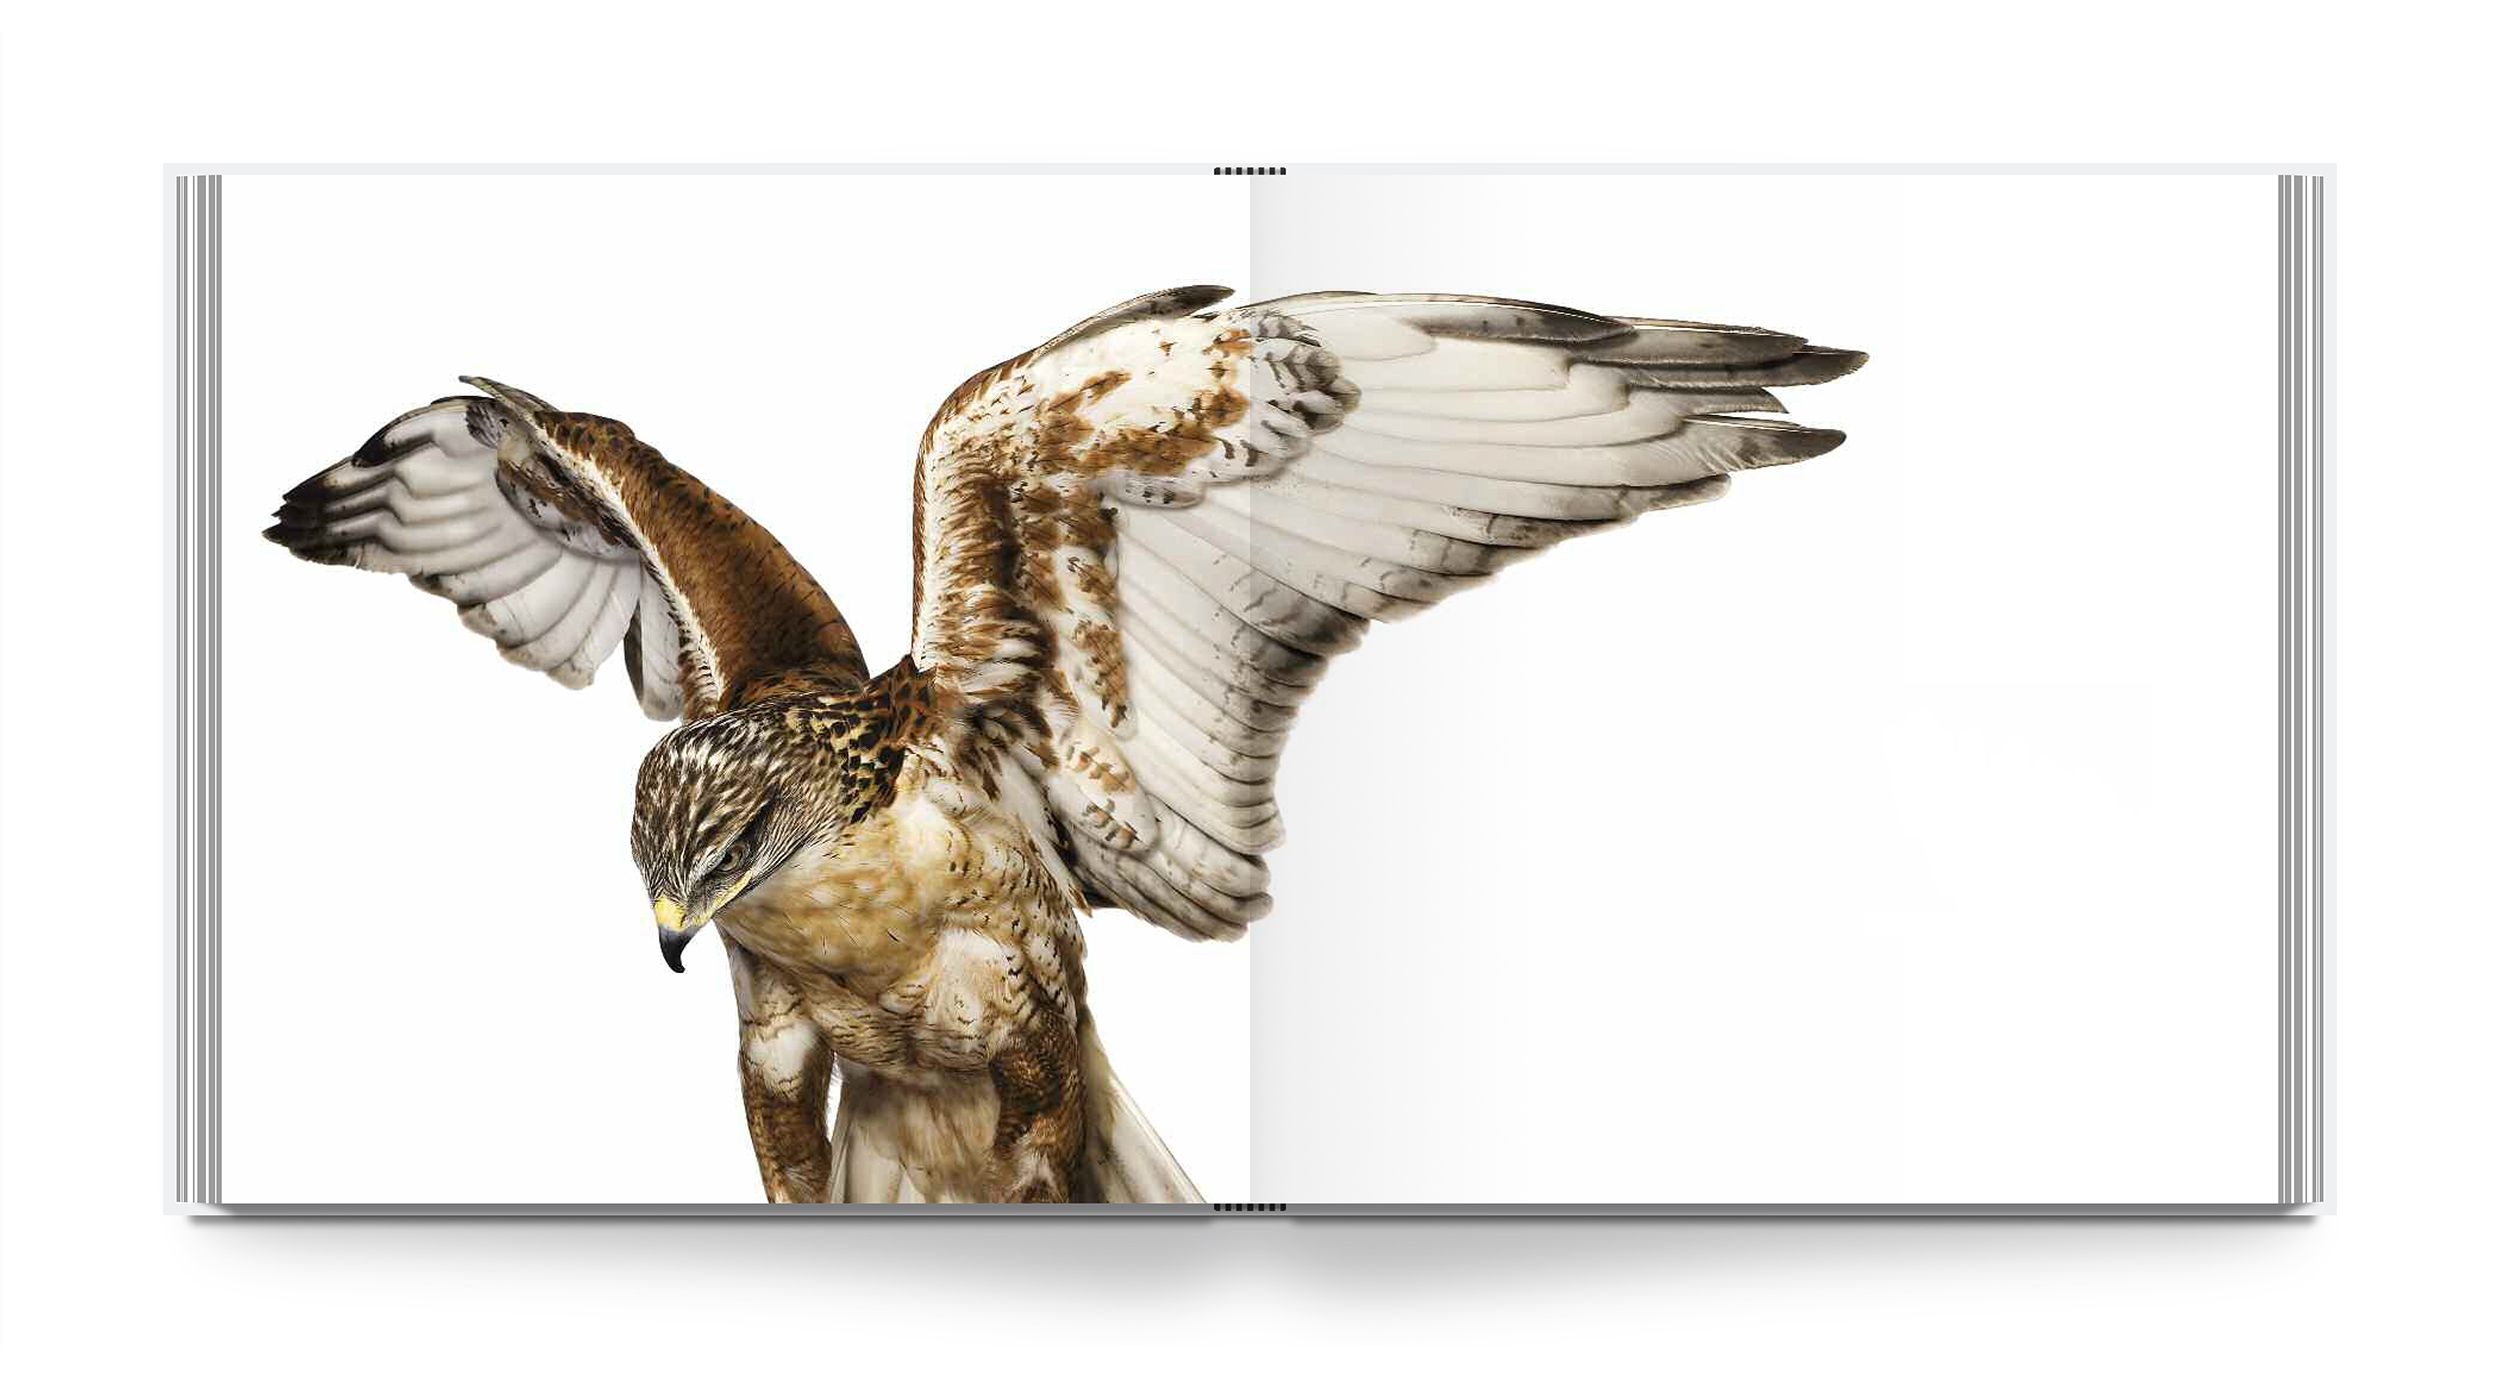 az-bird-int-2.jpg